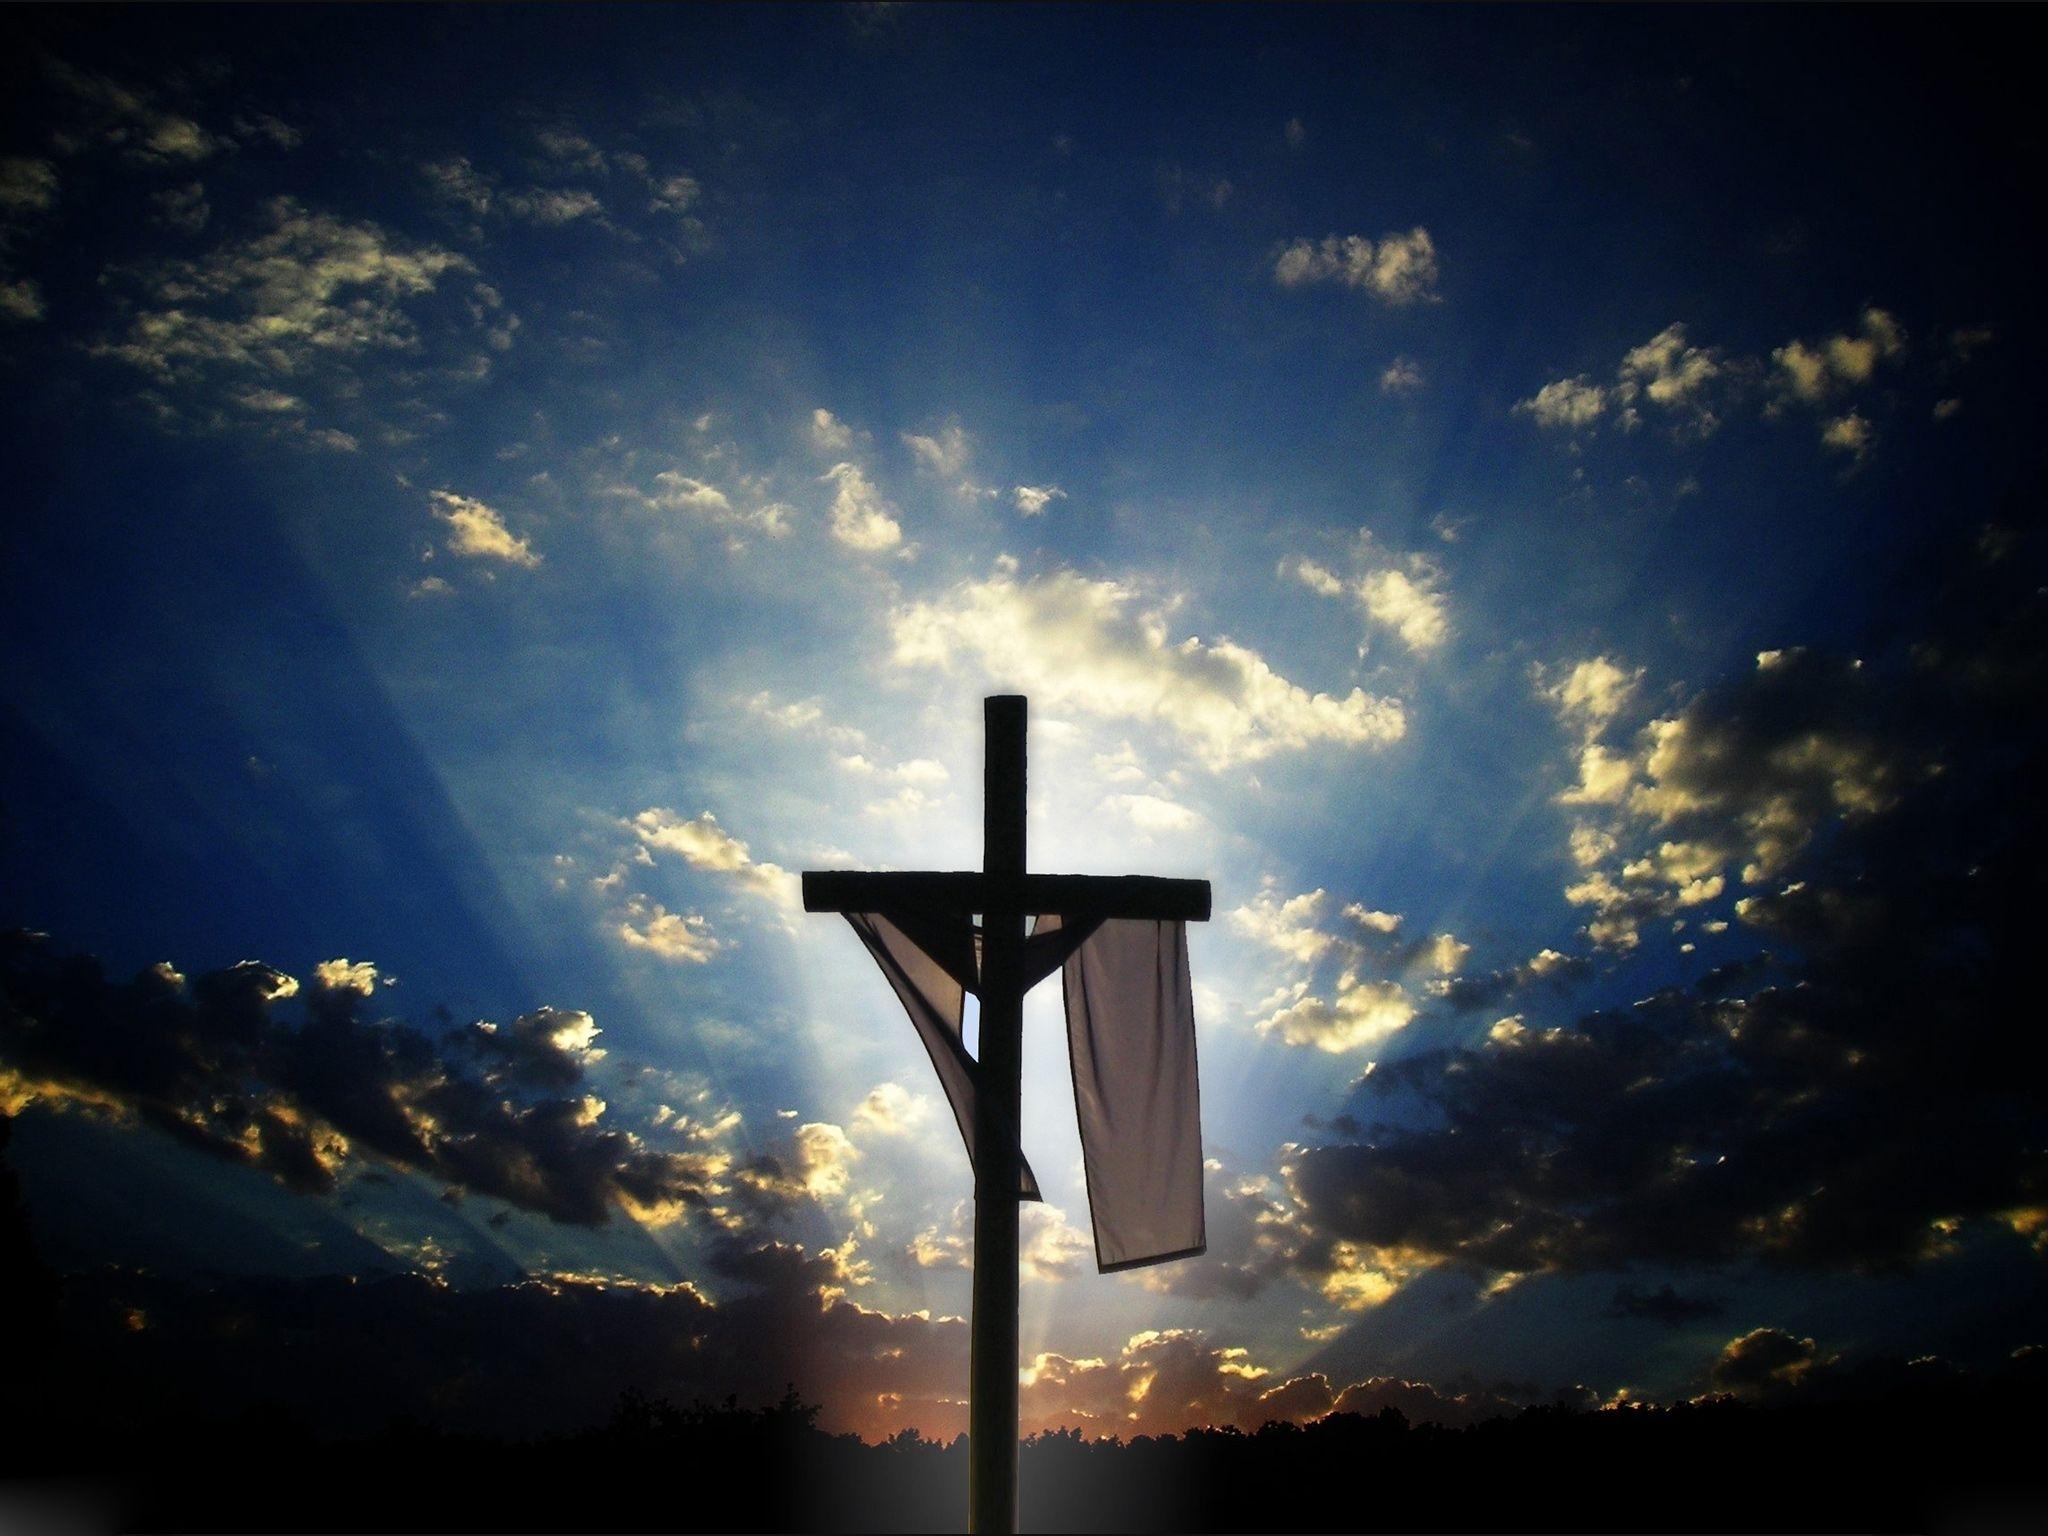 jesus-christ-cross-images-11 2,048×1,536 pixels | i am a